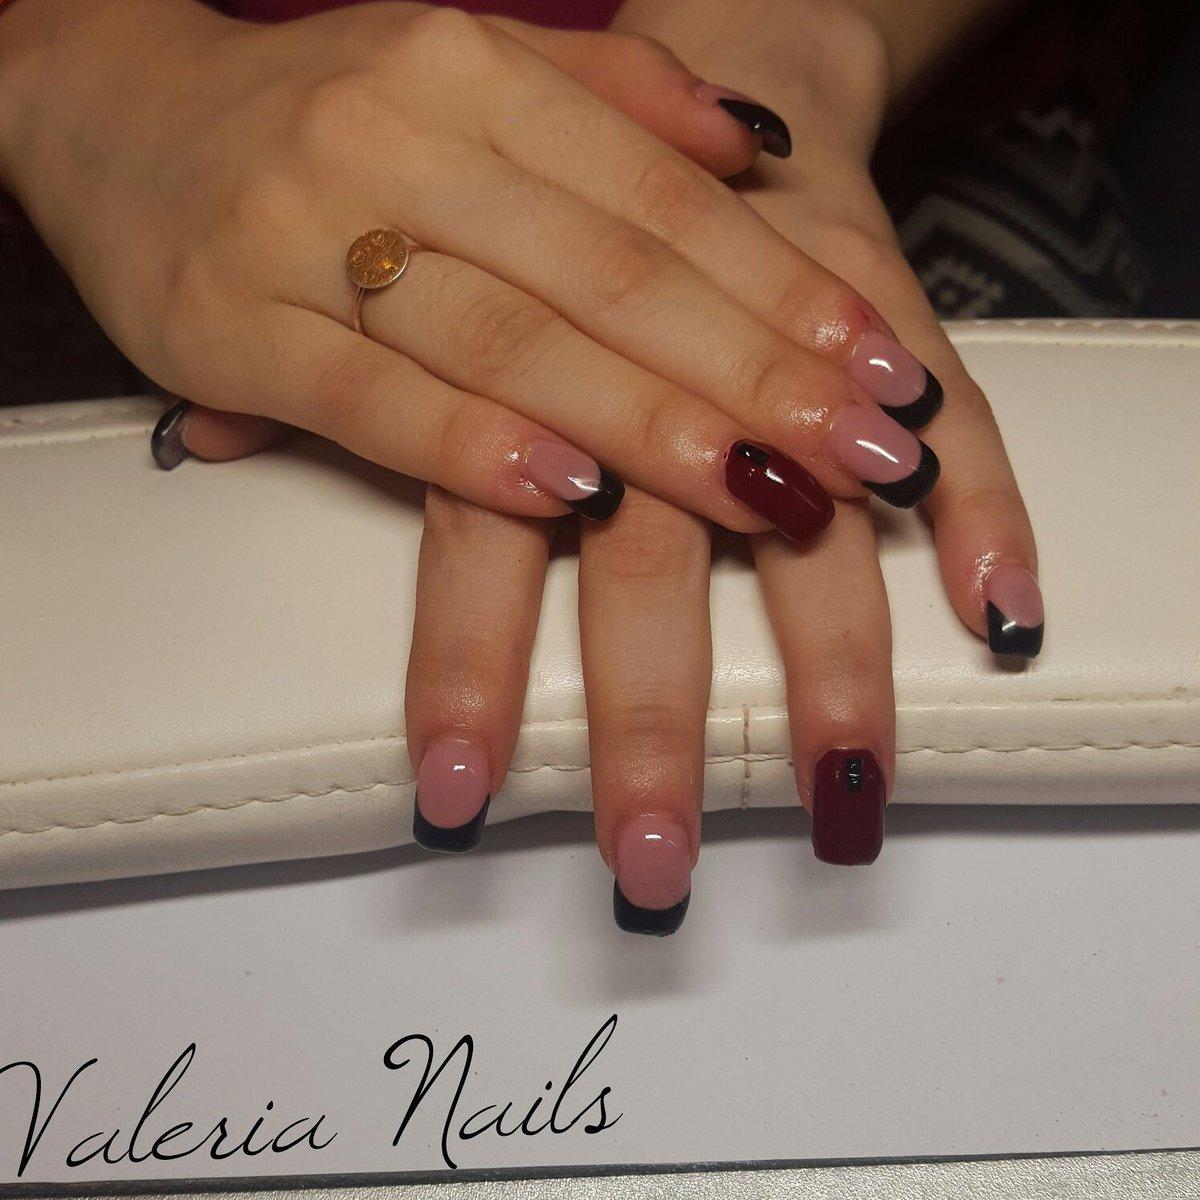 Valeria On Twitter Ricostruzione French Black Bordeaux Unghie Nails Gel Progressi Beautiful 2016 Tco ErY43SlxXB